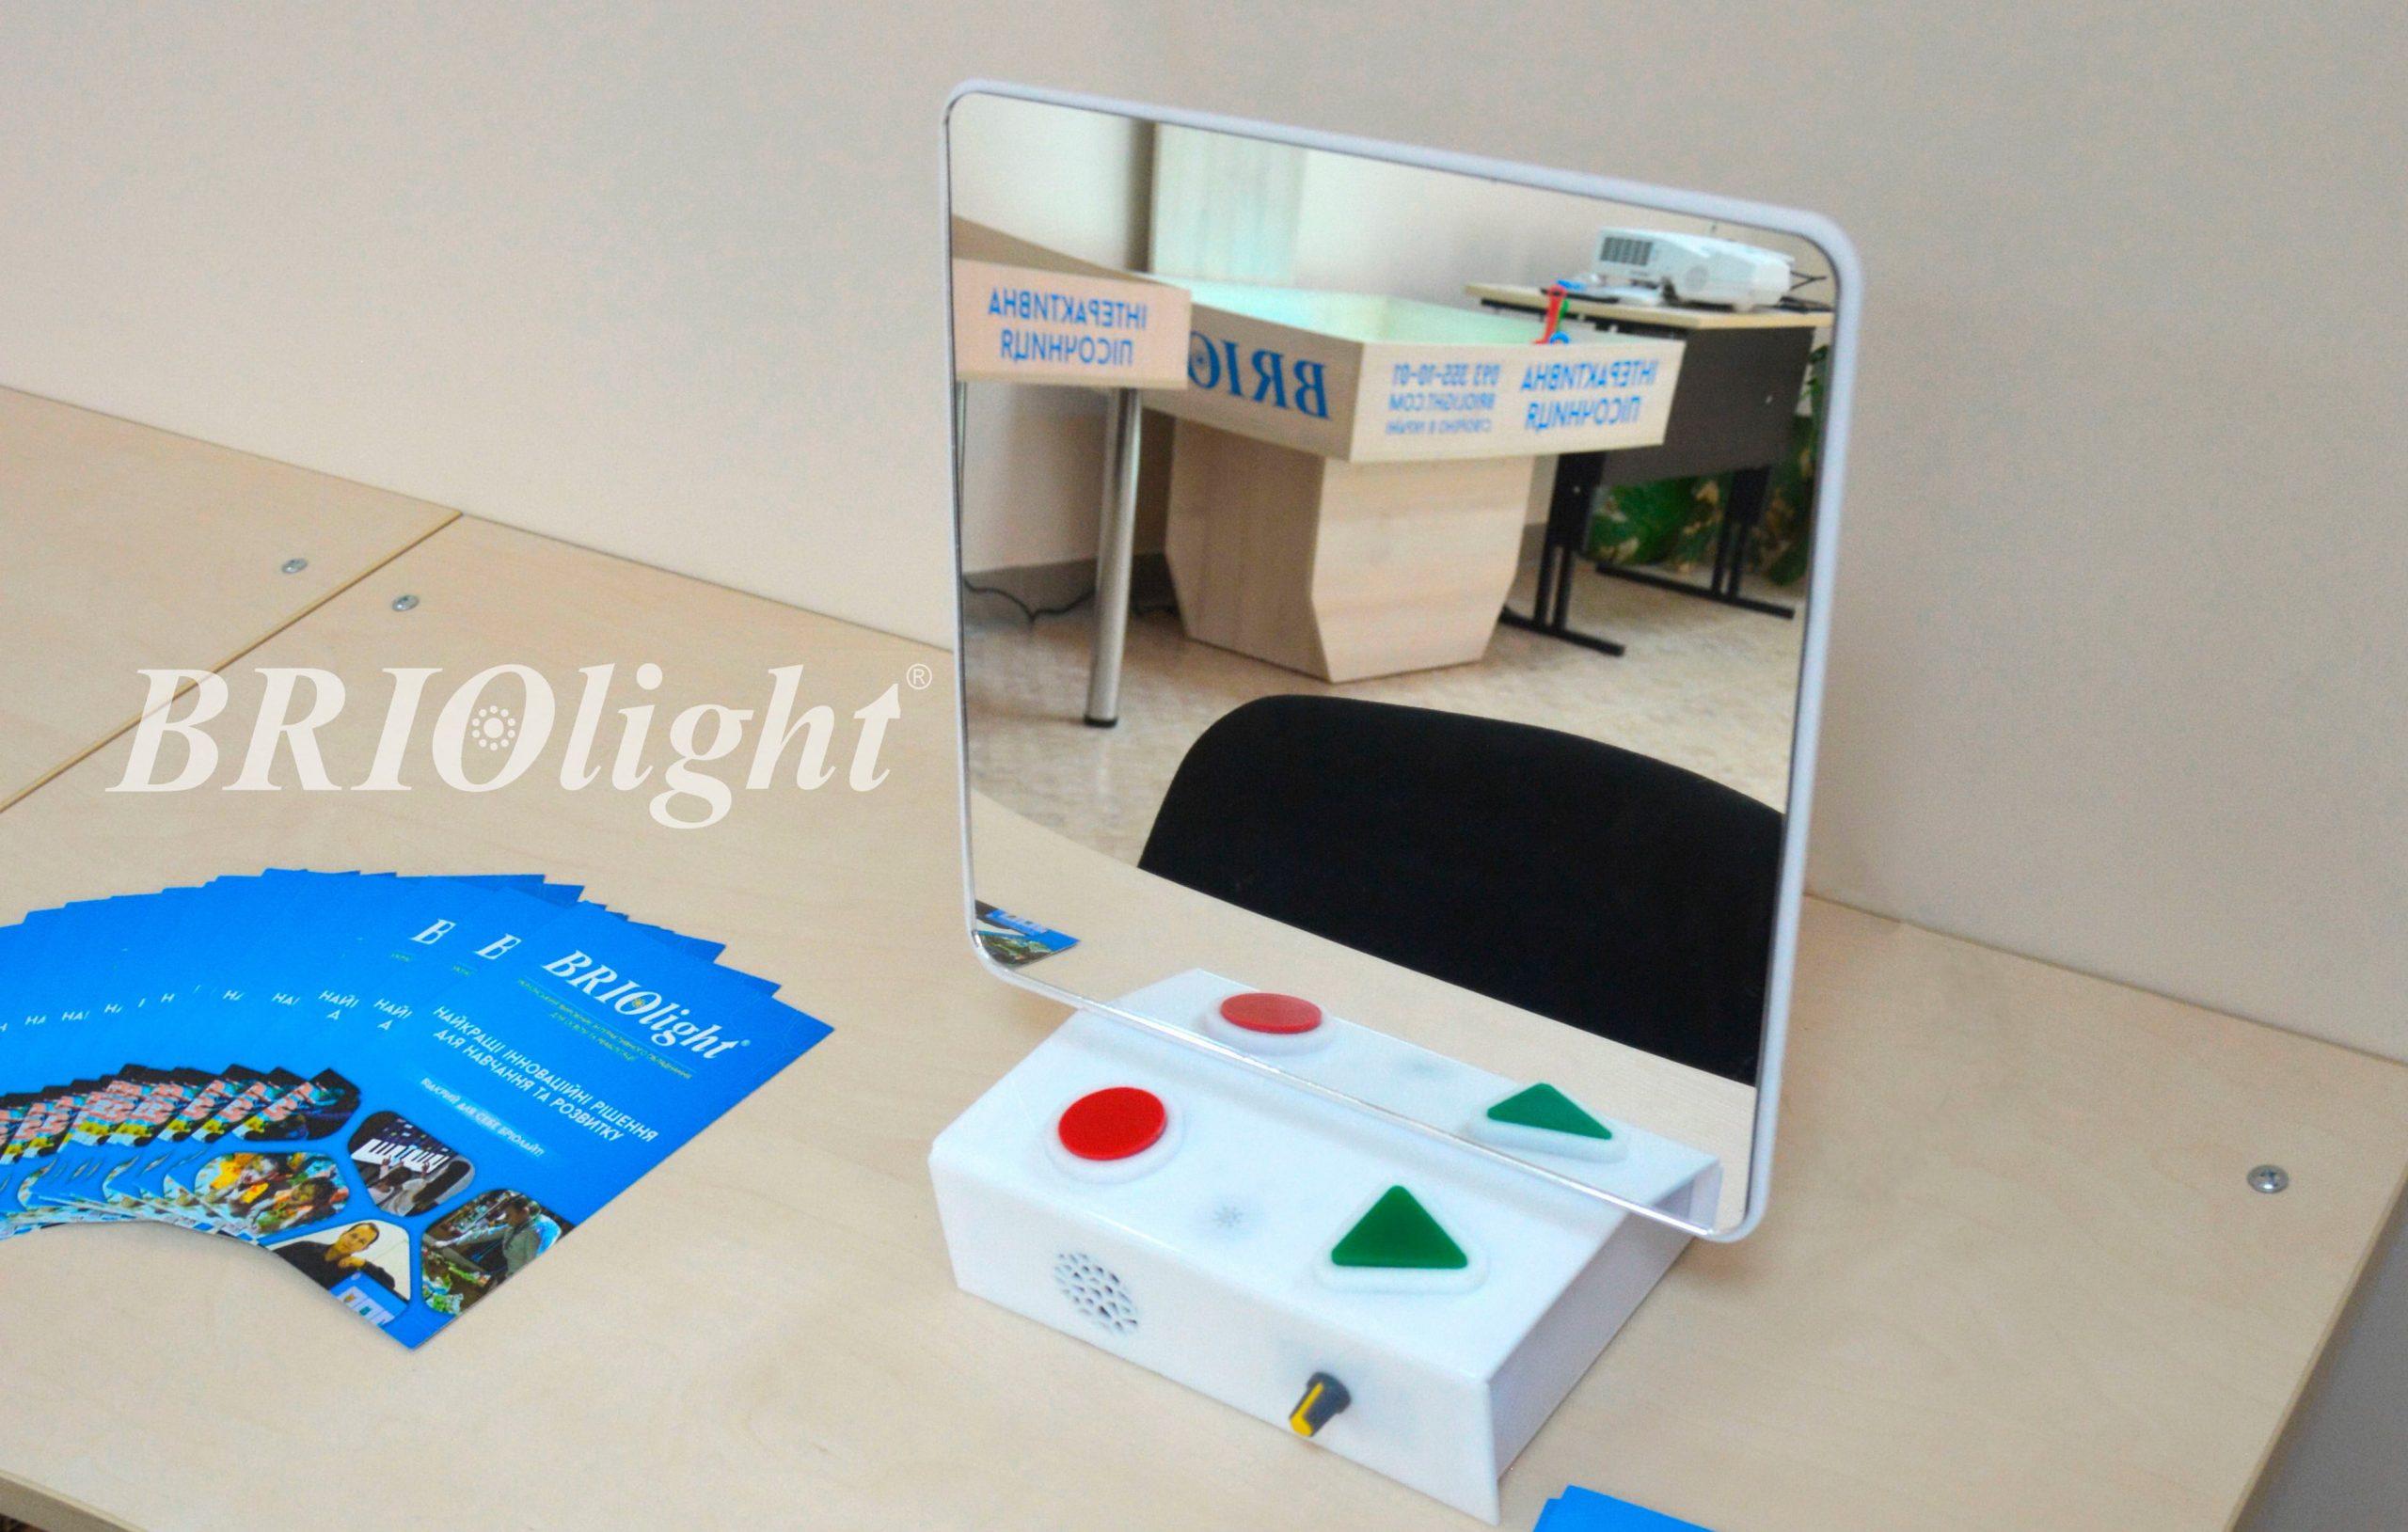 лопедичне дзеркало для ірц та дитсадка купити україна